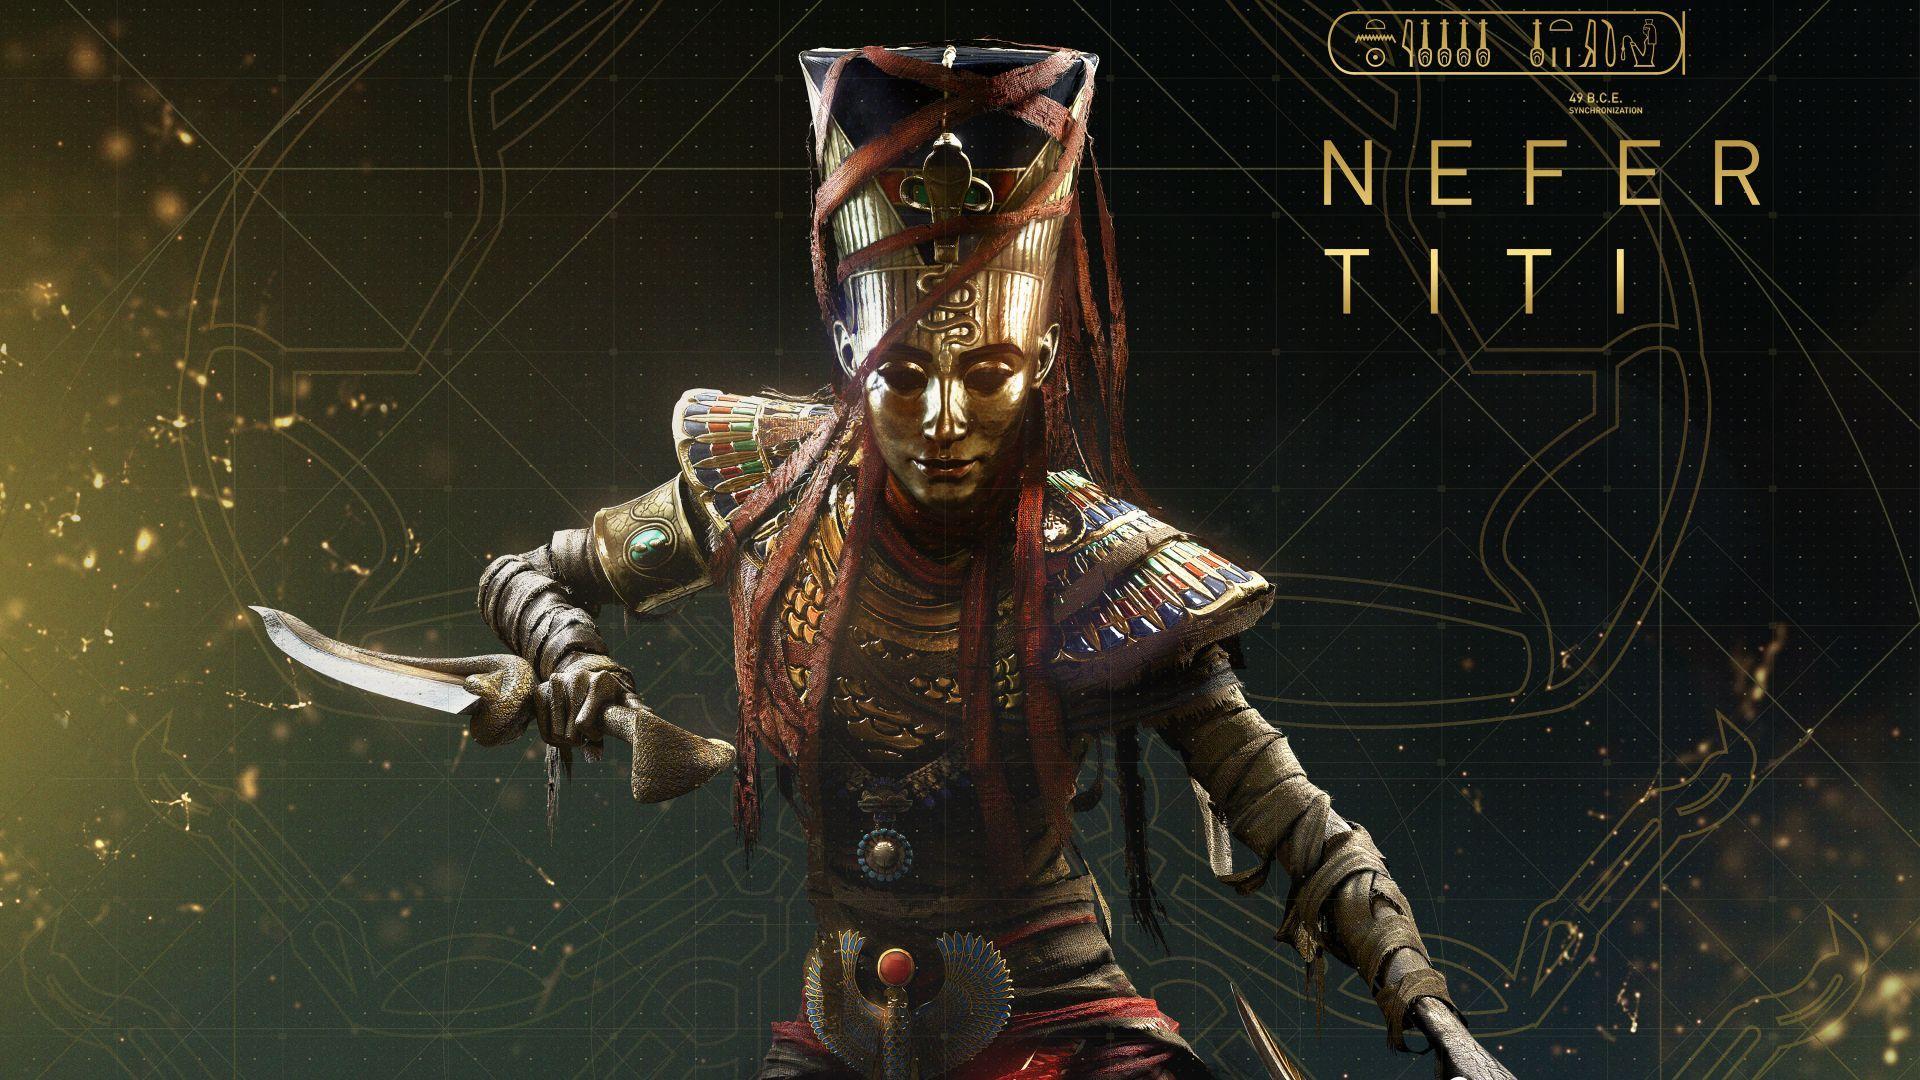 Download Wallpapers Of Assassin S Creed Origins Nefertiti Curse